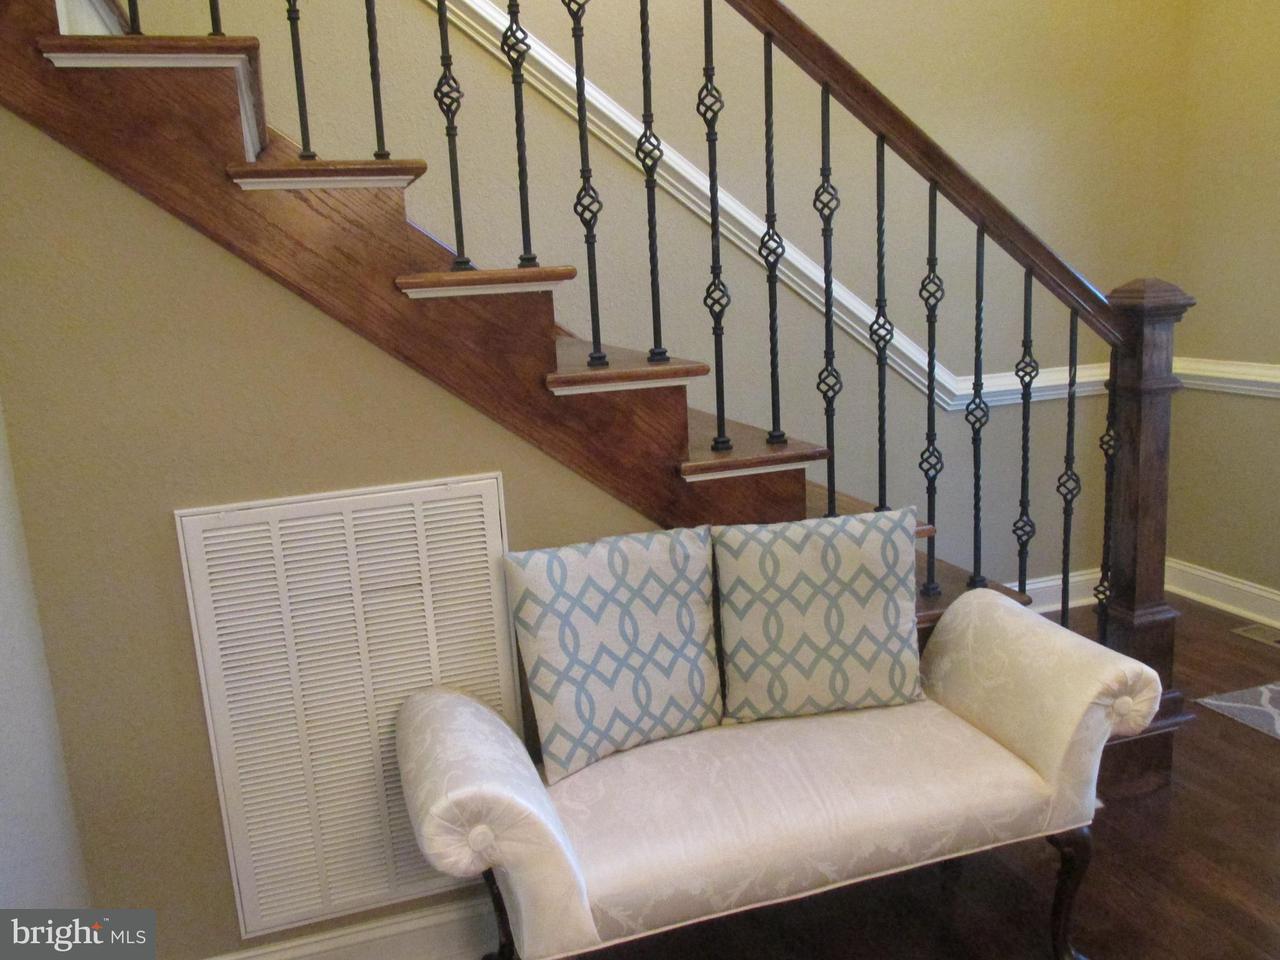 Additional photo for property listing at 5464 Moose Lodge Road 5464 Moose Lodge Road Cambridge, Maryland 21613 Stati Uniti